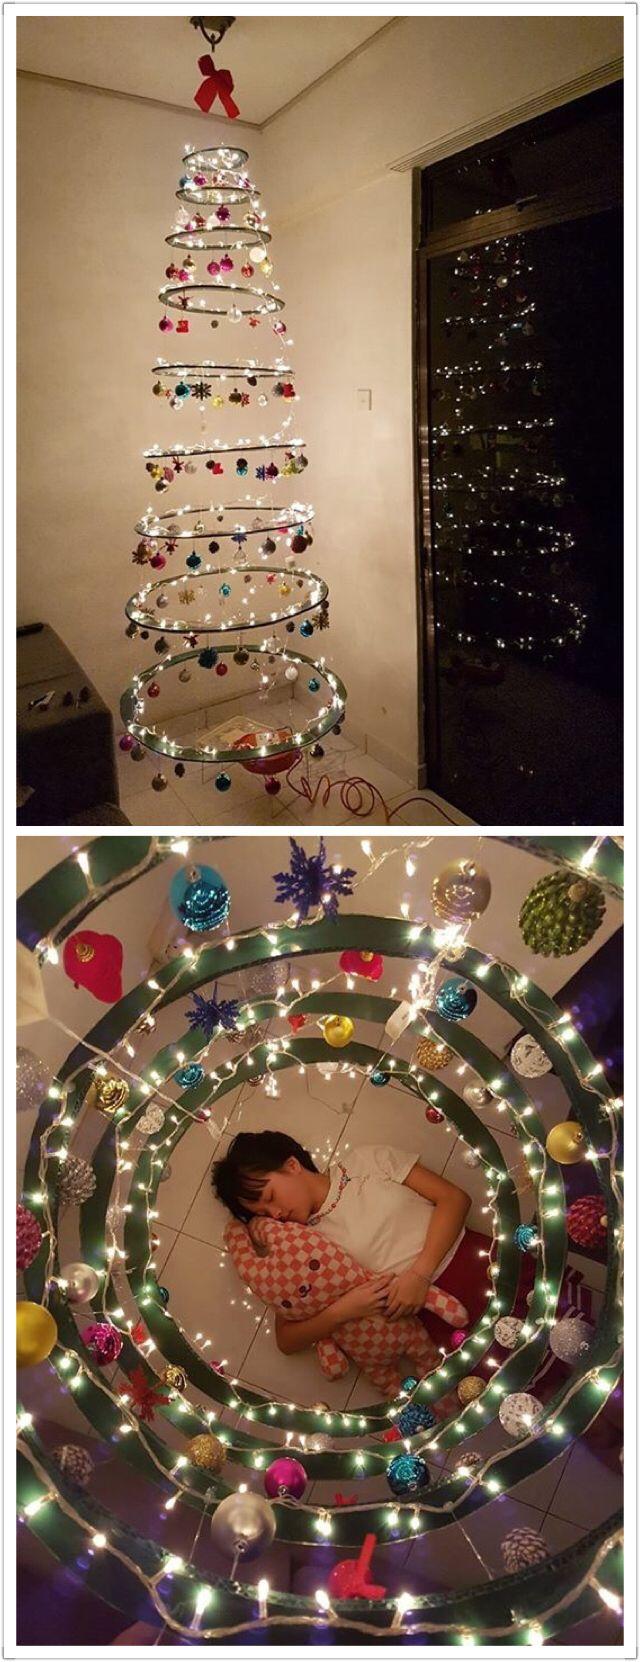 Pin By Kristy Wong On Great Value Daiso Tokutokuya Japan Home Valueshop Ikea Christmas Tree Christmas Tree Skirt Holiday Decor